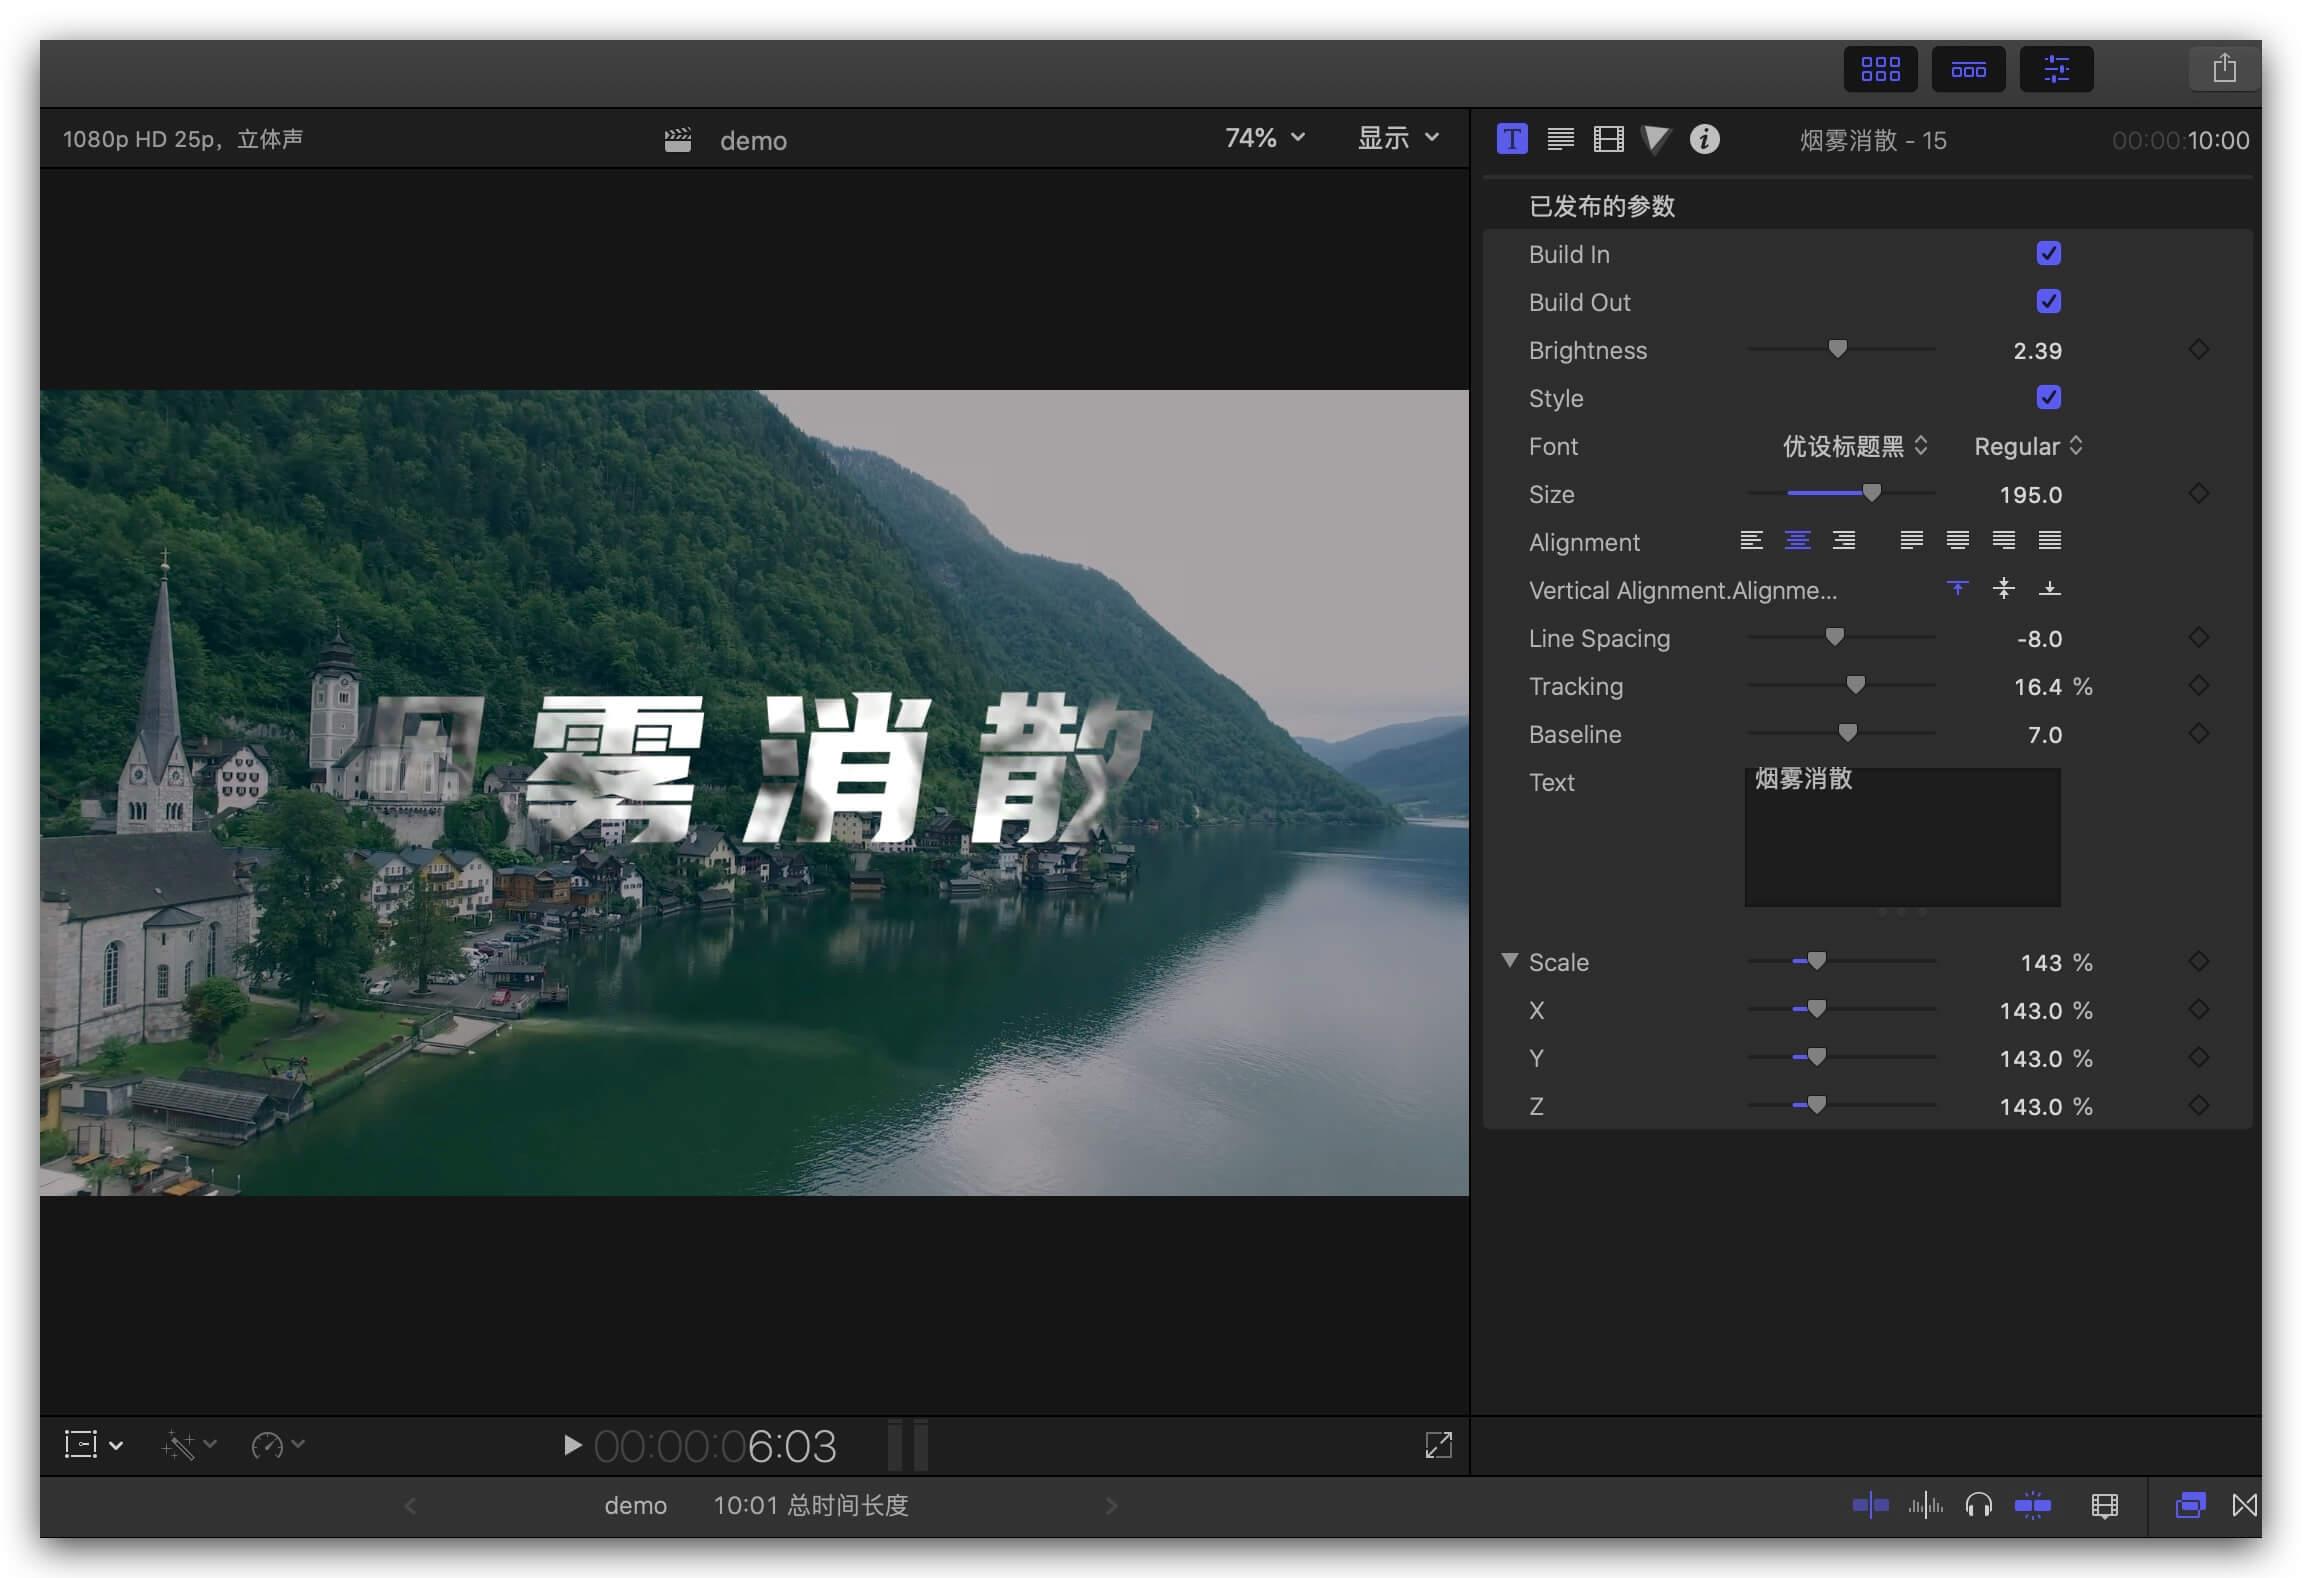 fcpx插件 烟雾消散特效字幕标题预设 Vlog常用标题样式